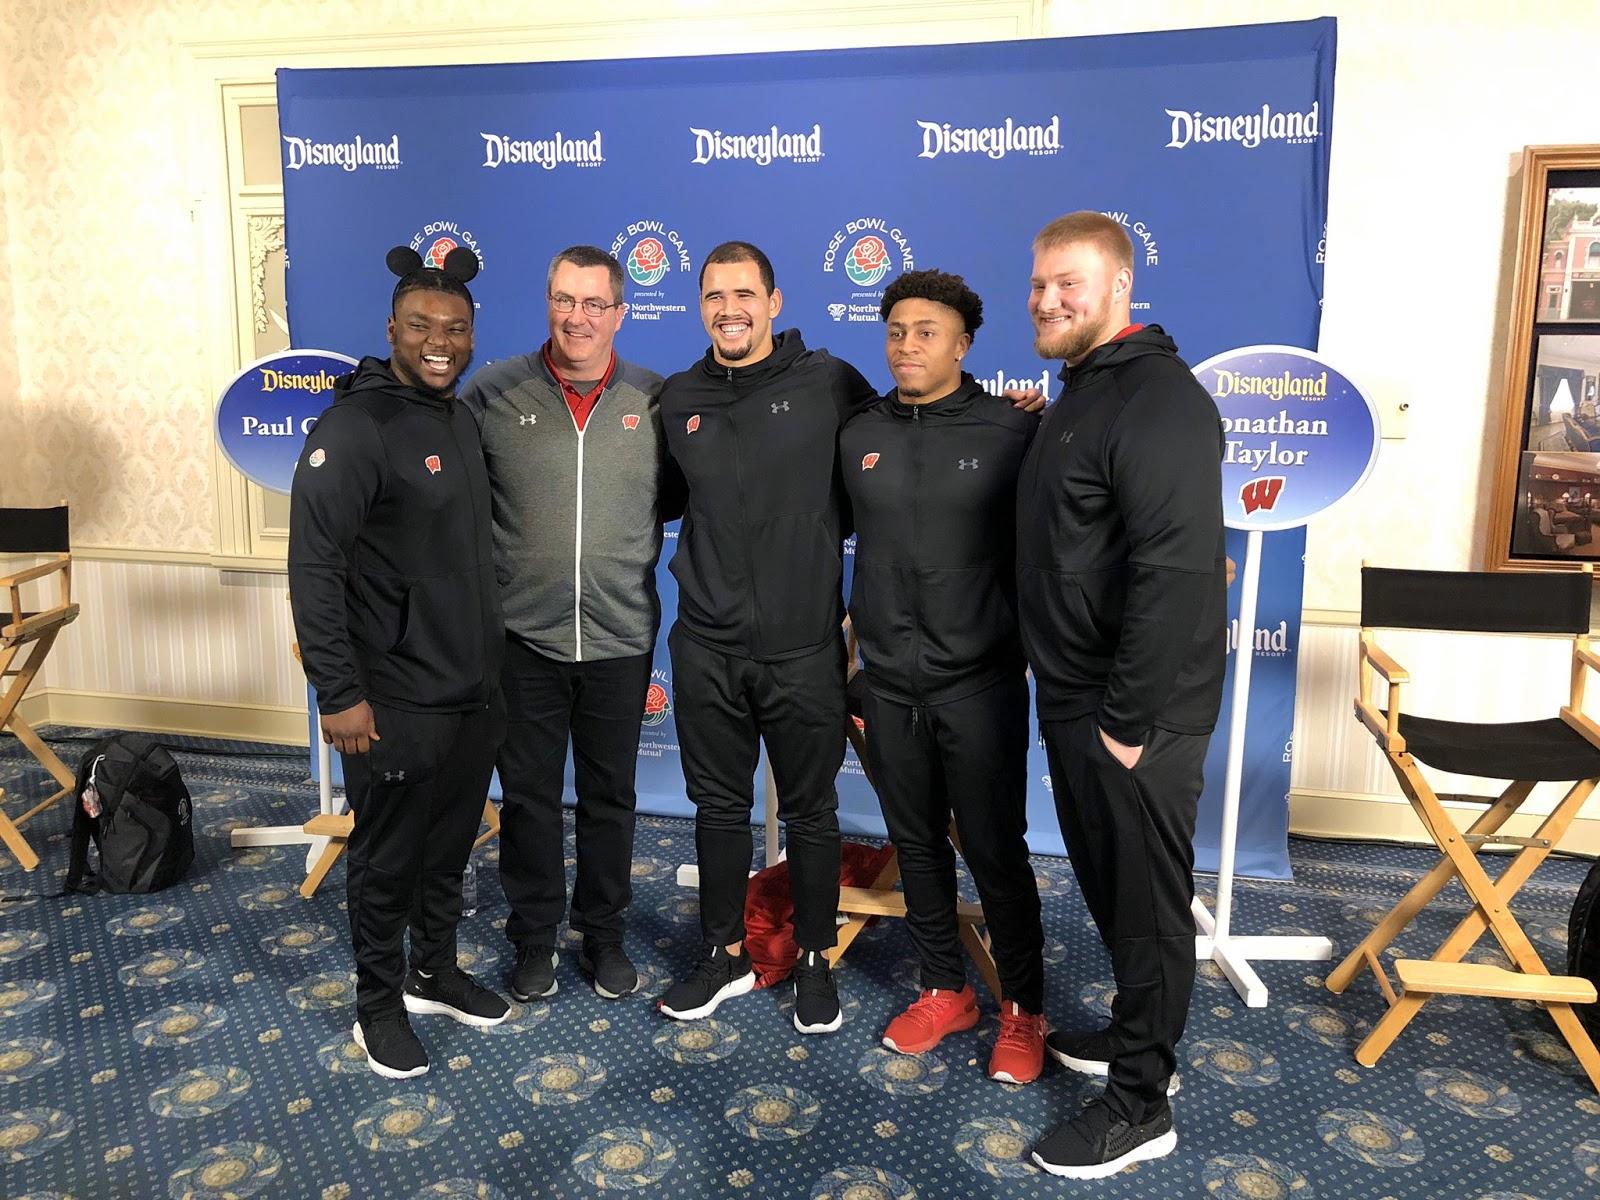 Video: 2020 Rose Bowl Teams Appear at Disneyland in ...